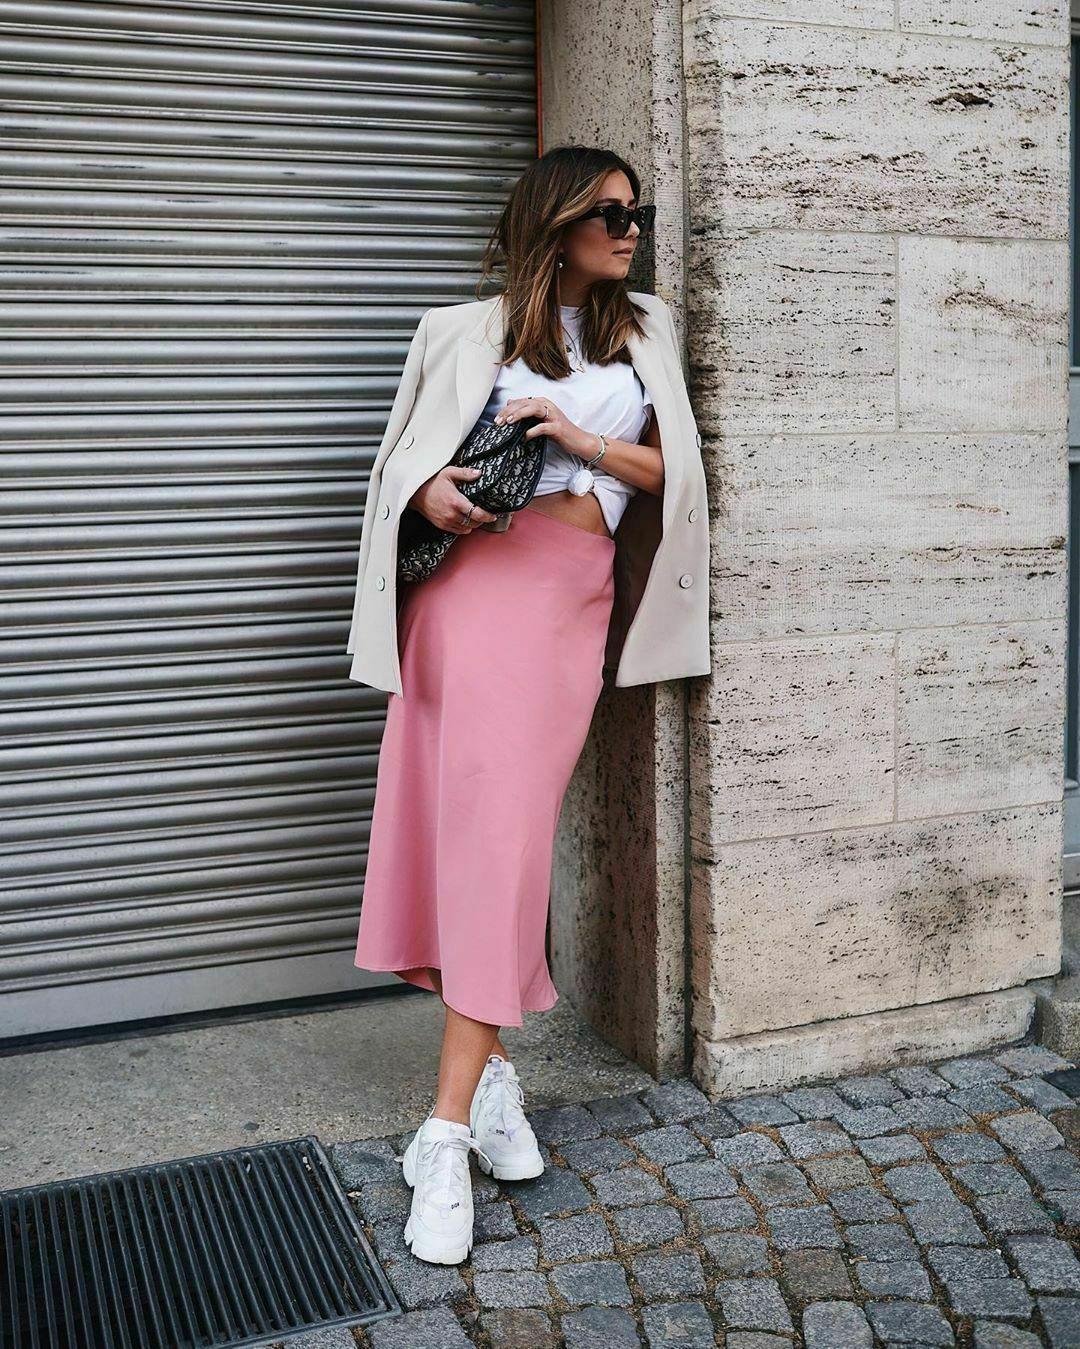 Details about Zara Pink Satin Midi Skirt Size L XL